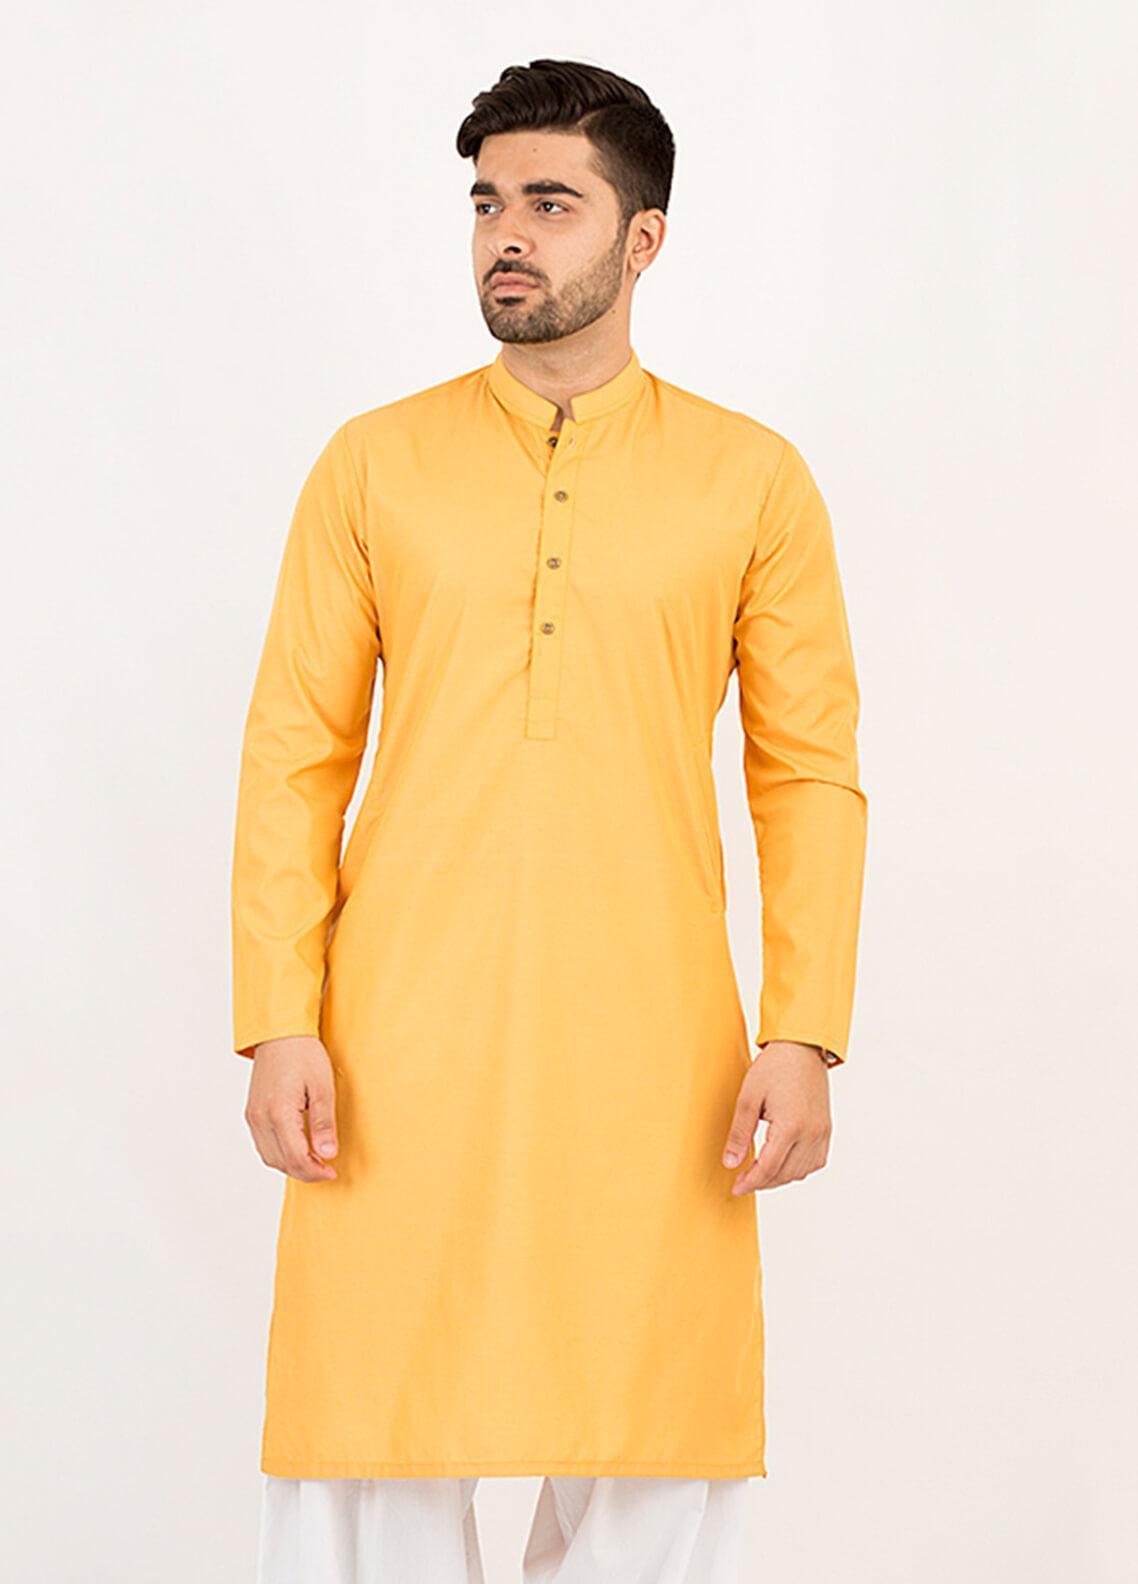 Shahzeb Saeed Wash N Wear Formal Kurta for Men - Mustard KURTA-111